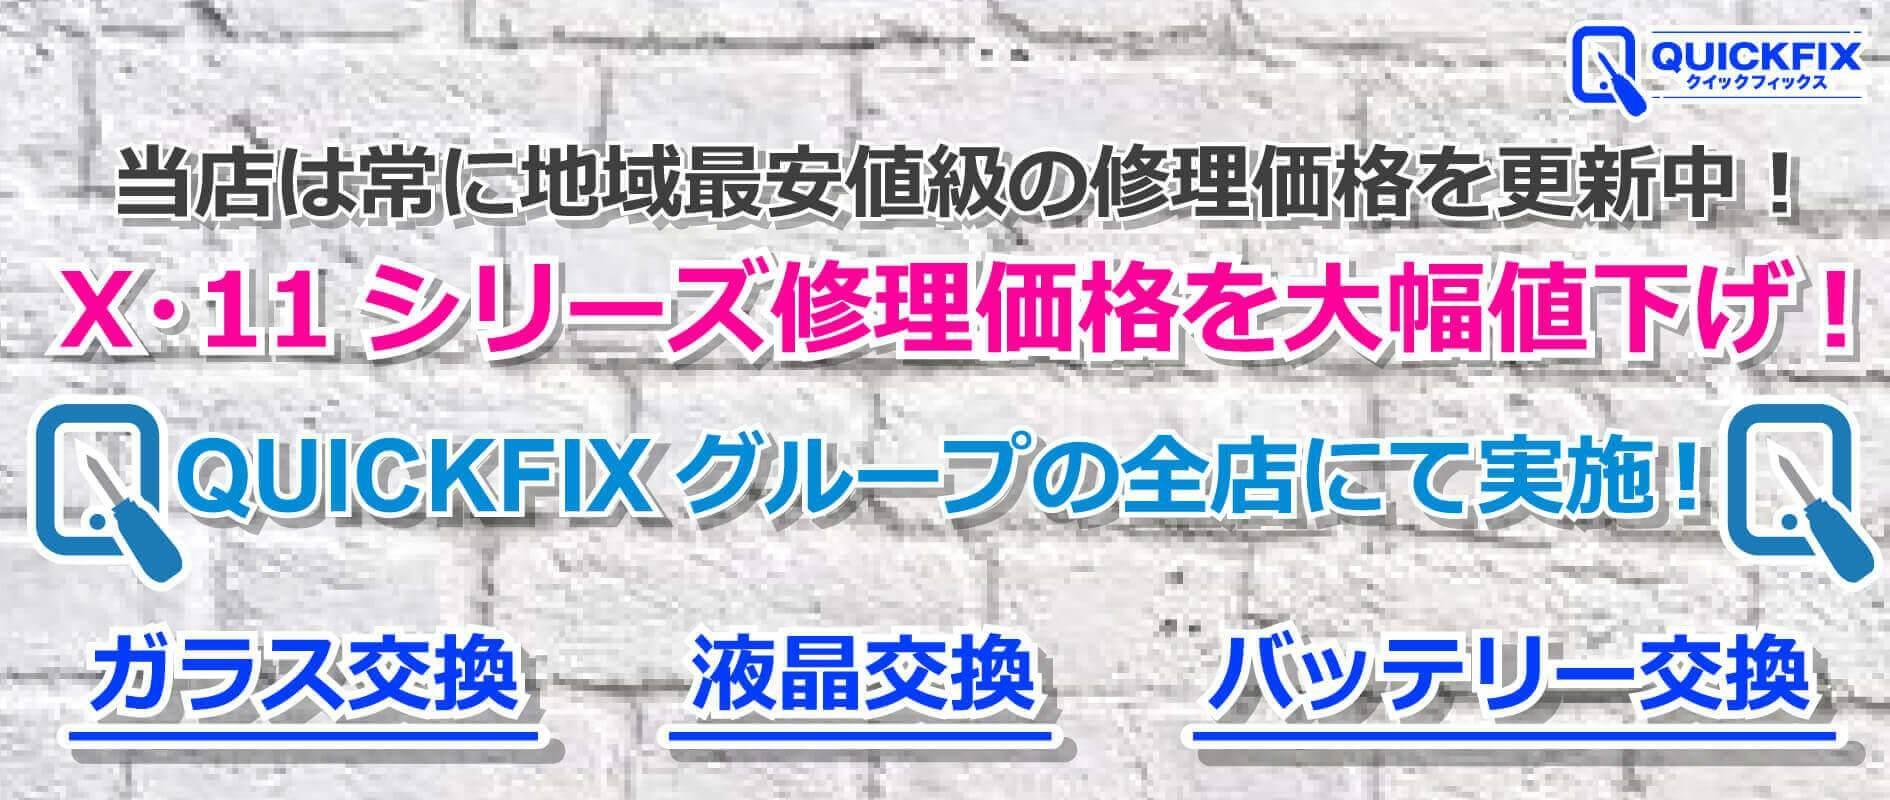 iPhoneXシリーズの修理 iPhone11シリーズの修理 徹底値下げ 大幅値下げ 地域最安値級の修理価格